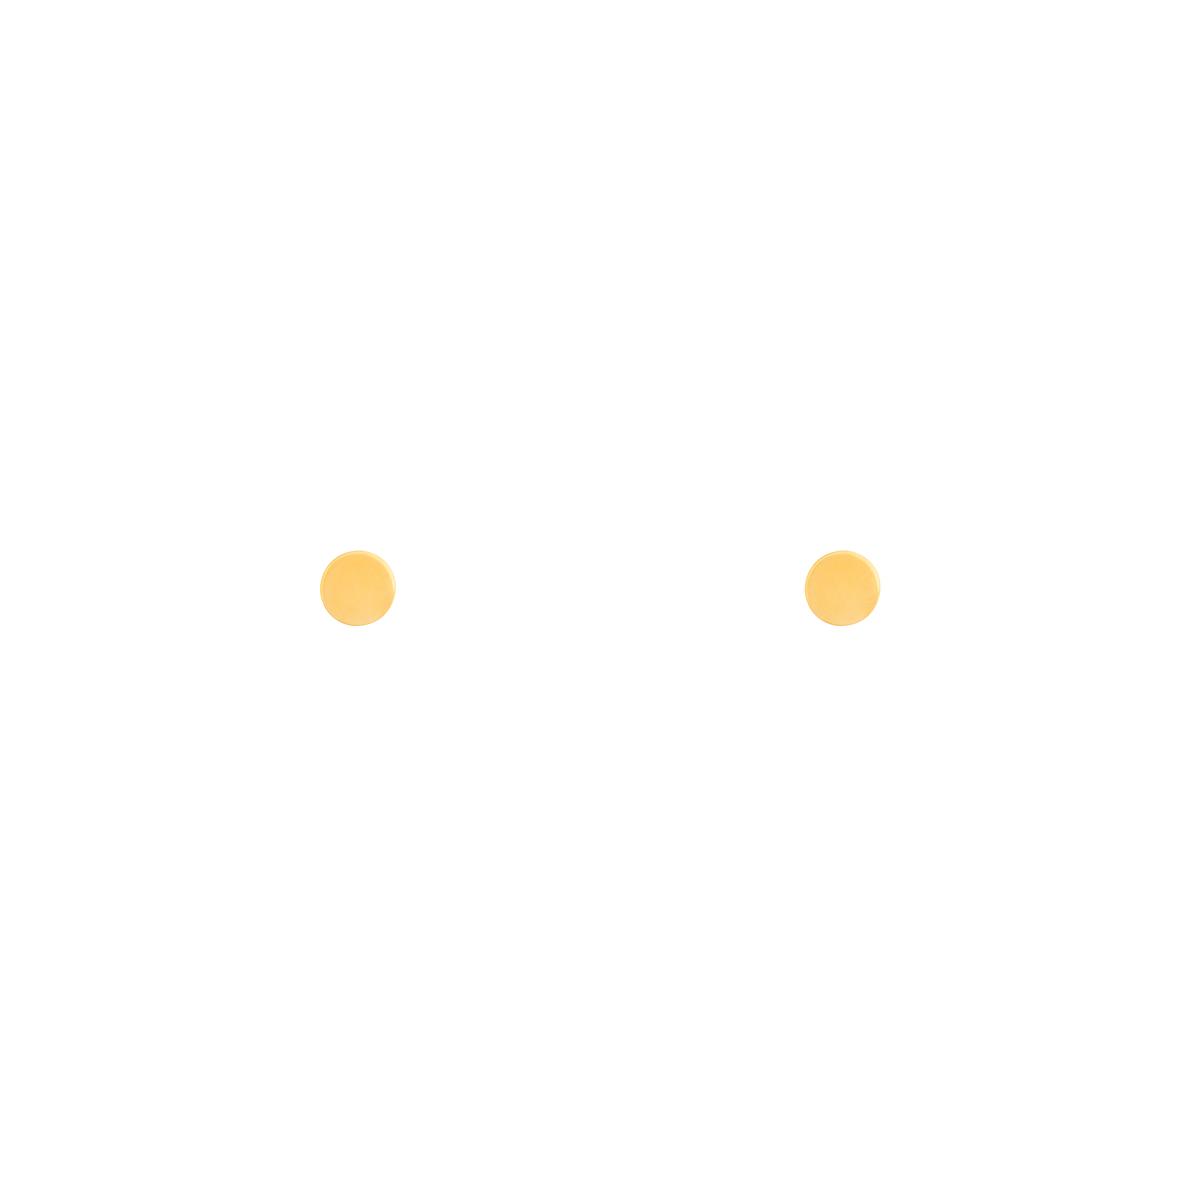 گوشواره طلا دایره بزرگ